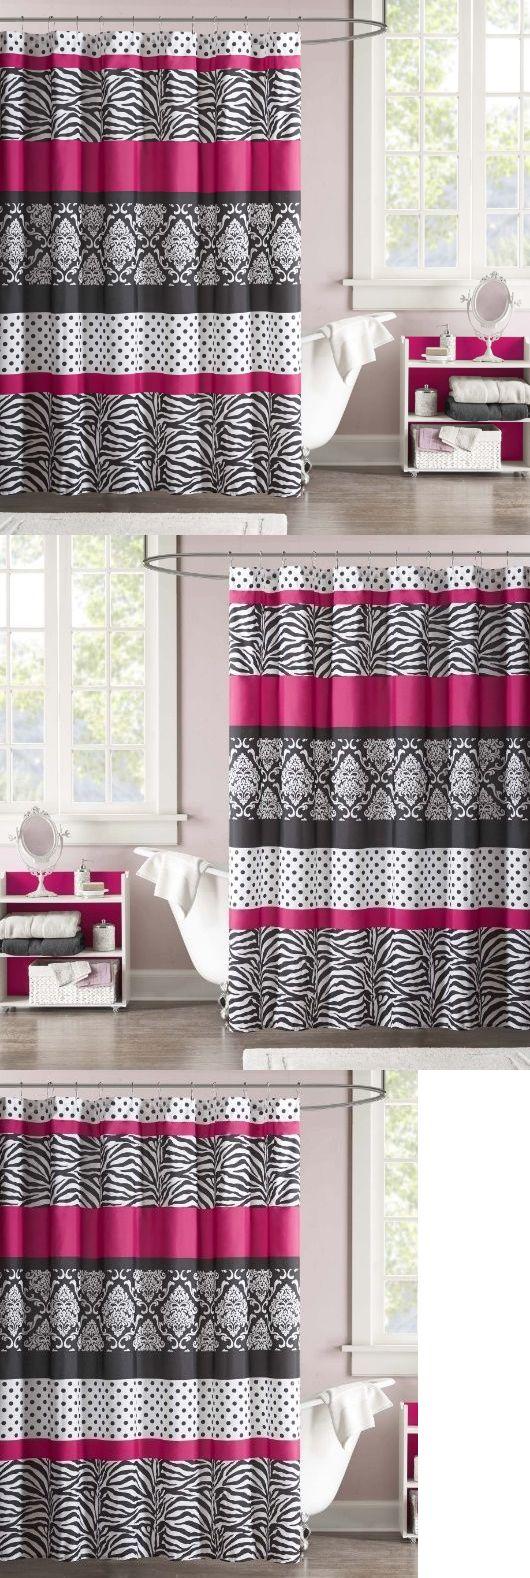 Shower Curtains 20441: Fabric Shower Curtain Kids Teens Pink Stripes Polka Dot Zebra Print Bathroom 72 -> BUY IT NOW ONLY: $36.99 on eBay!